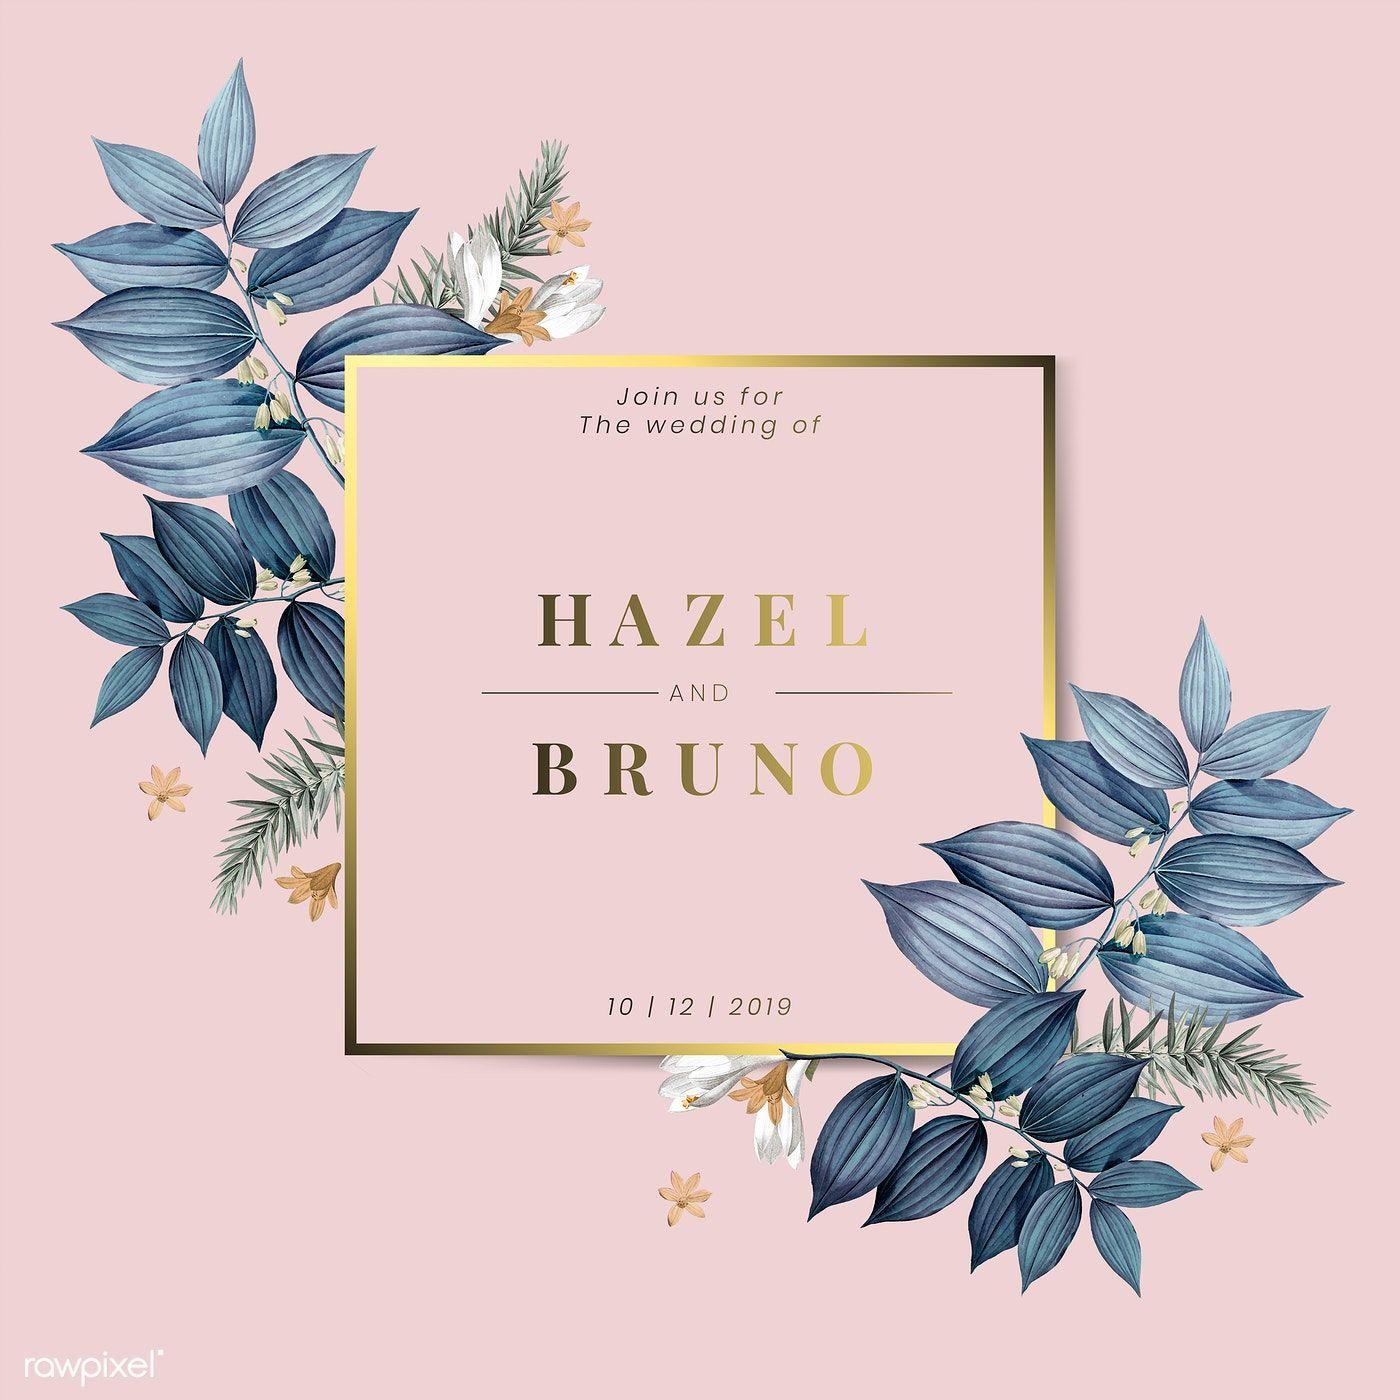 Download Premium Vector Of Floral Wedding Invitation Card Design Vector Floral Wedding Invitations Wedding Invitation Card Design Invitation Card Design